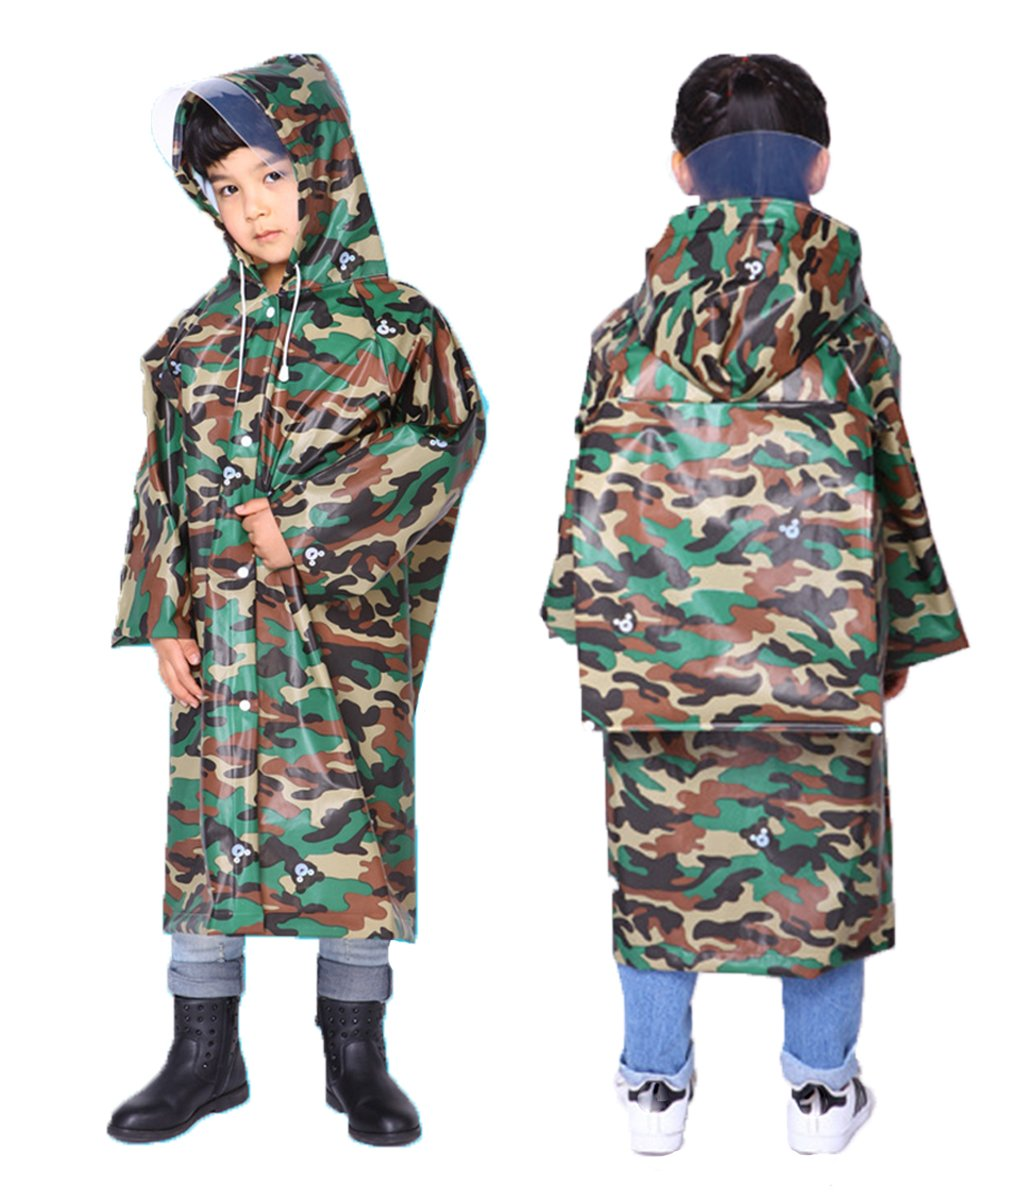 AYUBOOM Children Raincoat,Rainwear with School Bag Cover,Ages 4-14,Lightweight Rain Ponchos to Toddler, Boys,Girls (L)